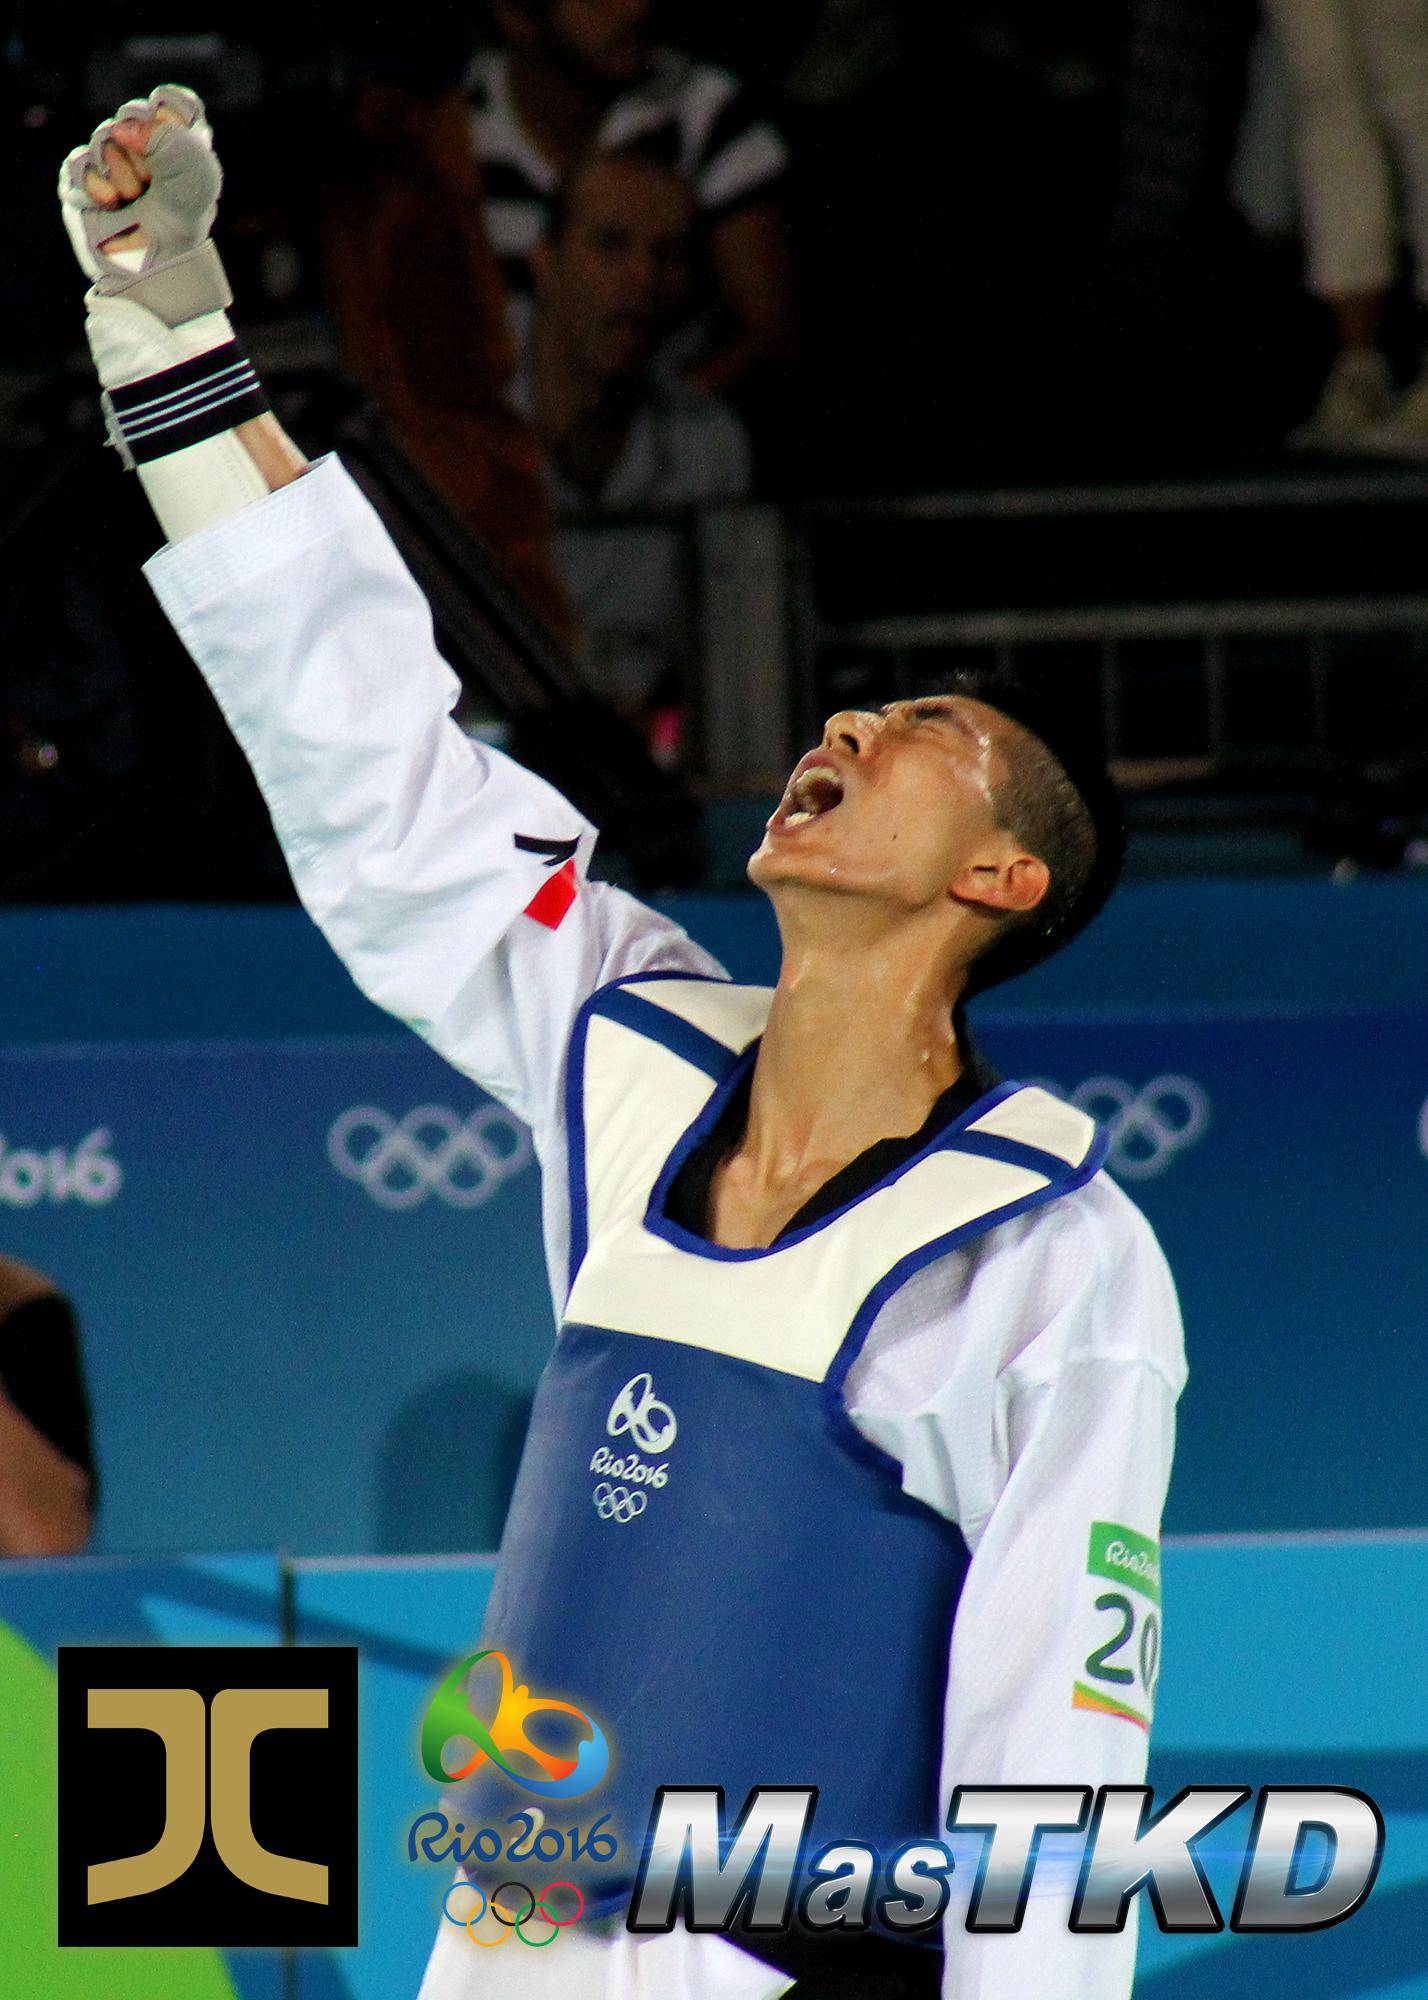 20160817_Taekwondo_JC_masTKD_Rio2016_08